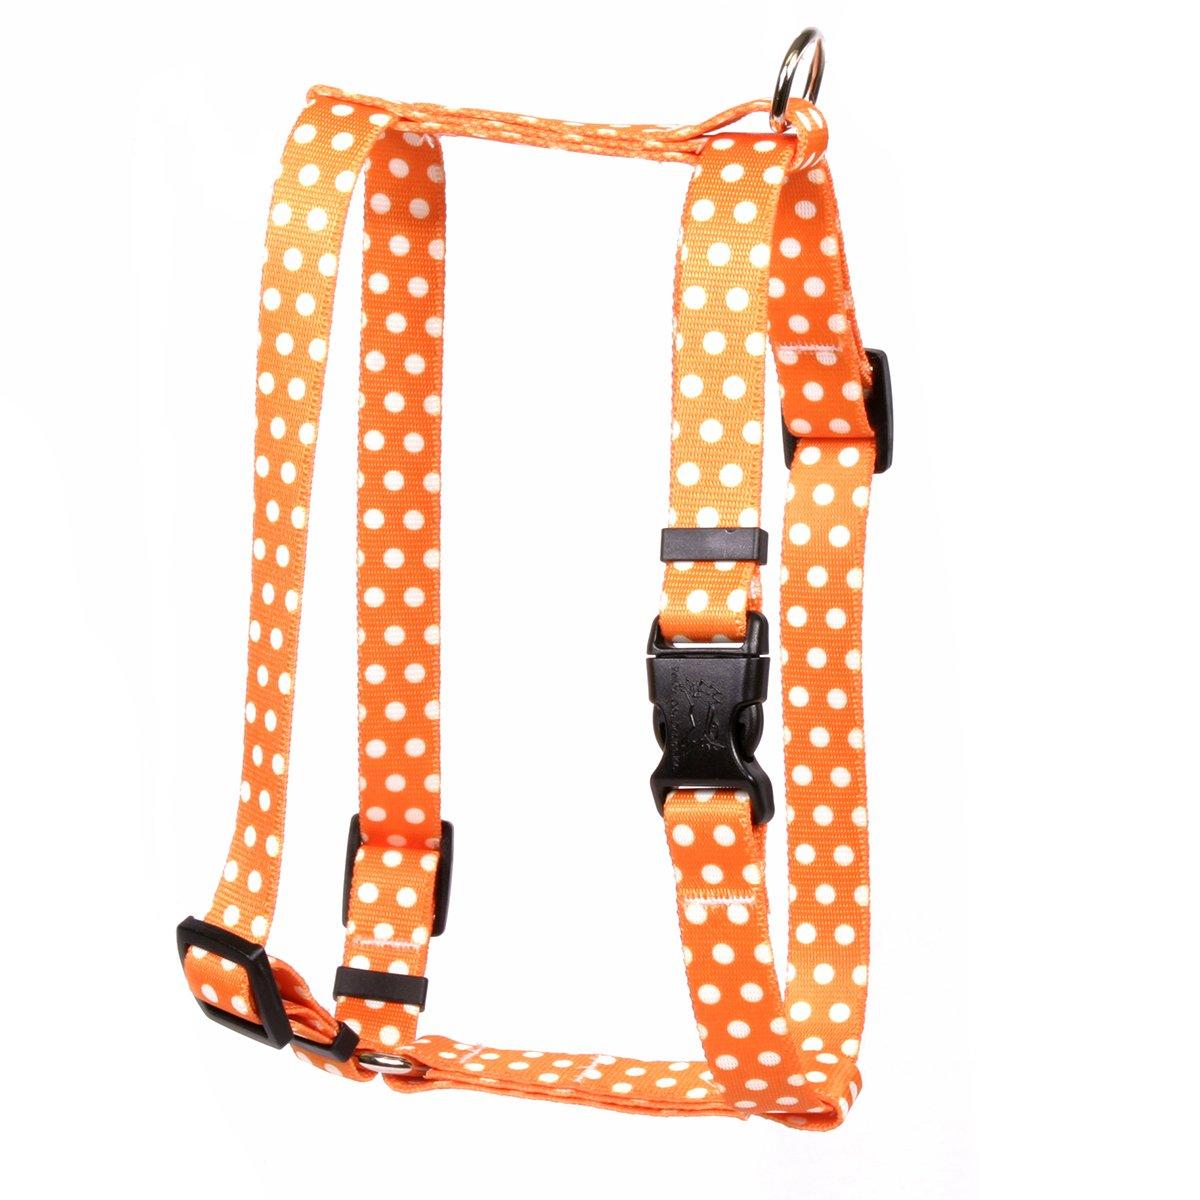 Yellow Dog Design Orange Polka Dot Roman H Dog Harness, Small/Medium-3/4 Wide fits Chest of 14 to 20''